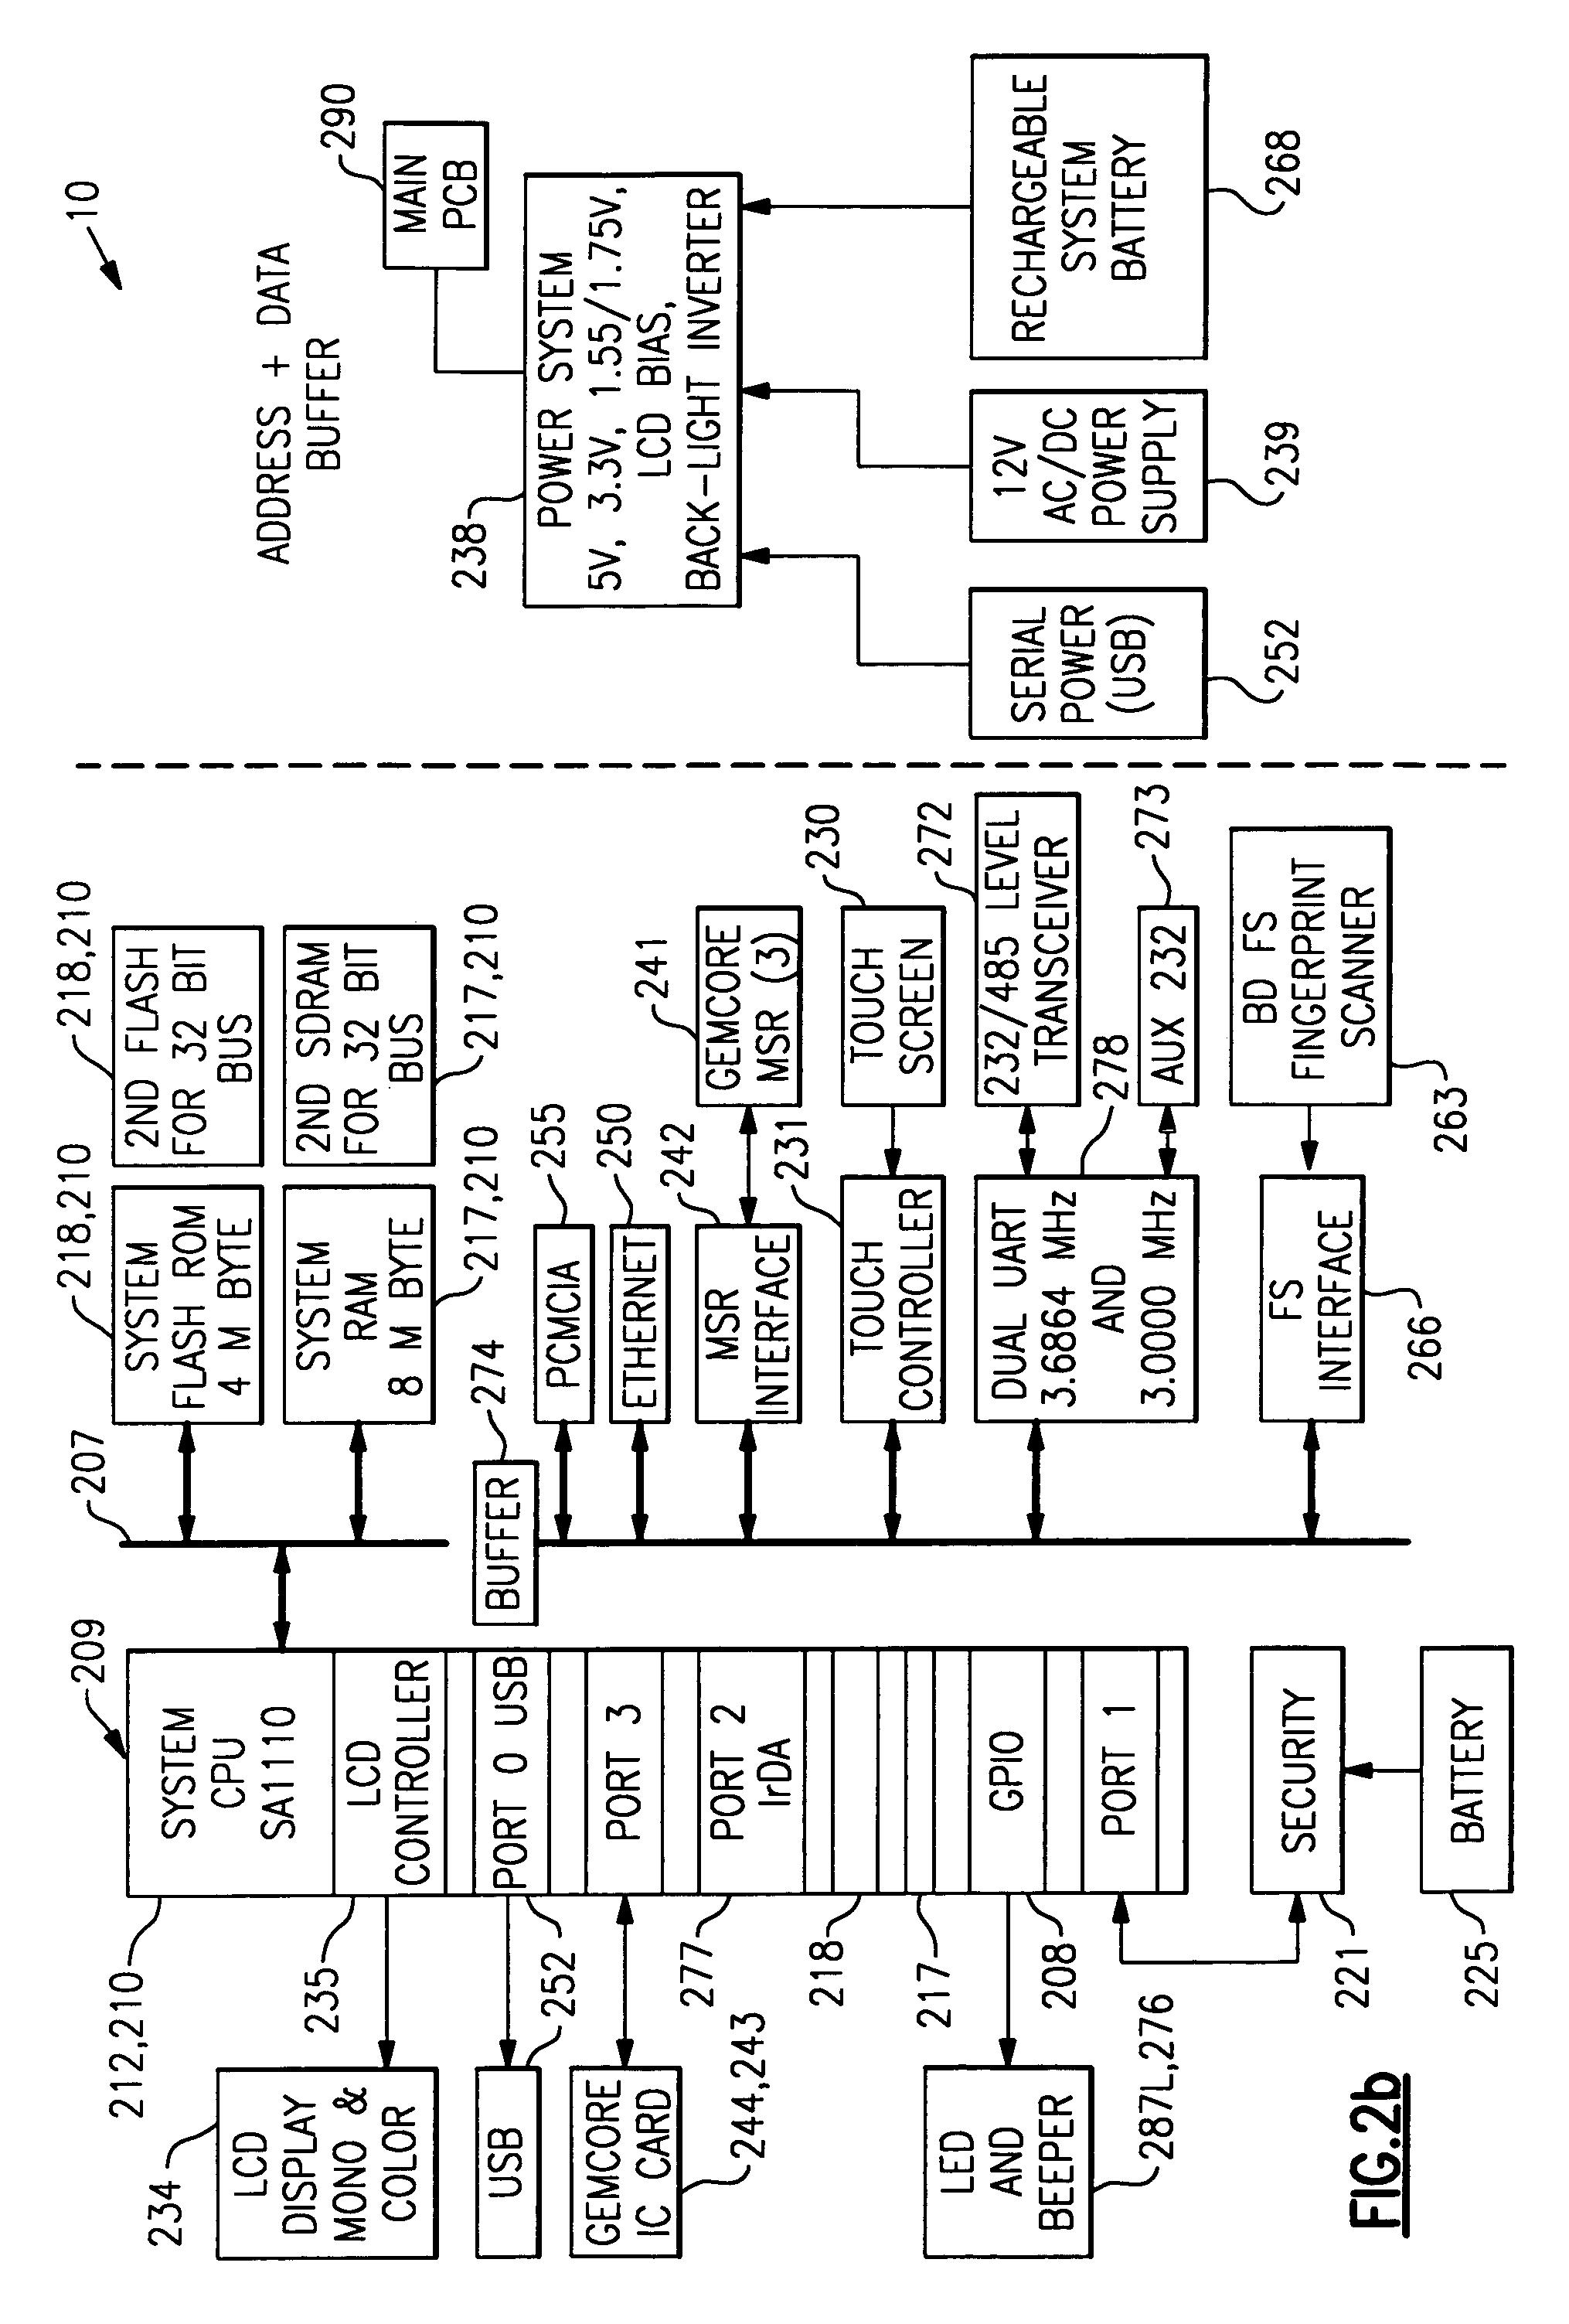 Patent Us 7451917 B2 Four Move Checkmate Diagram